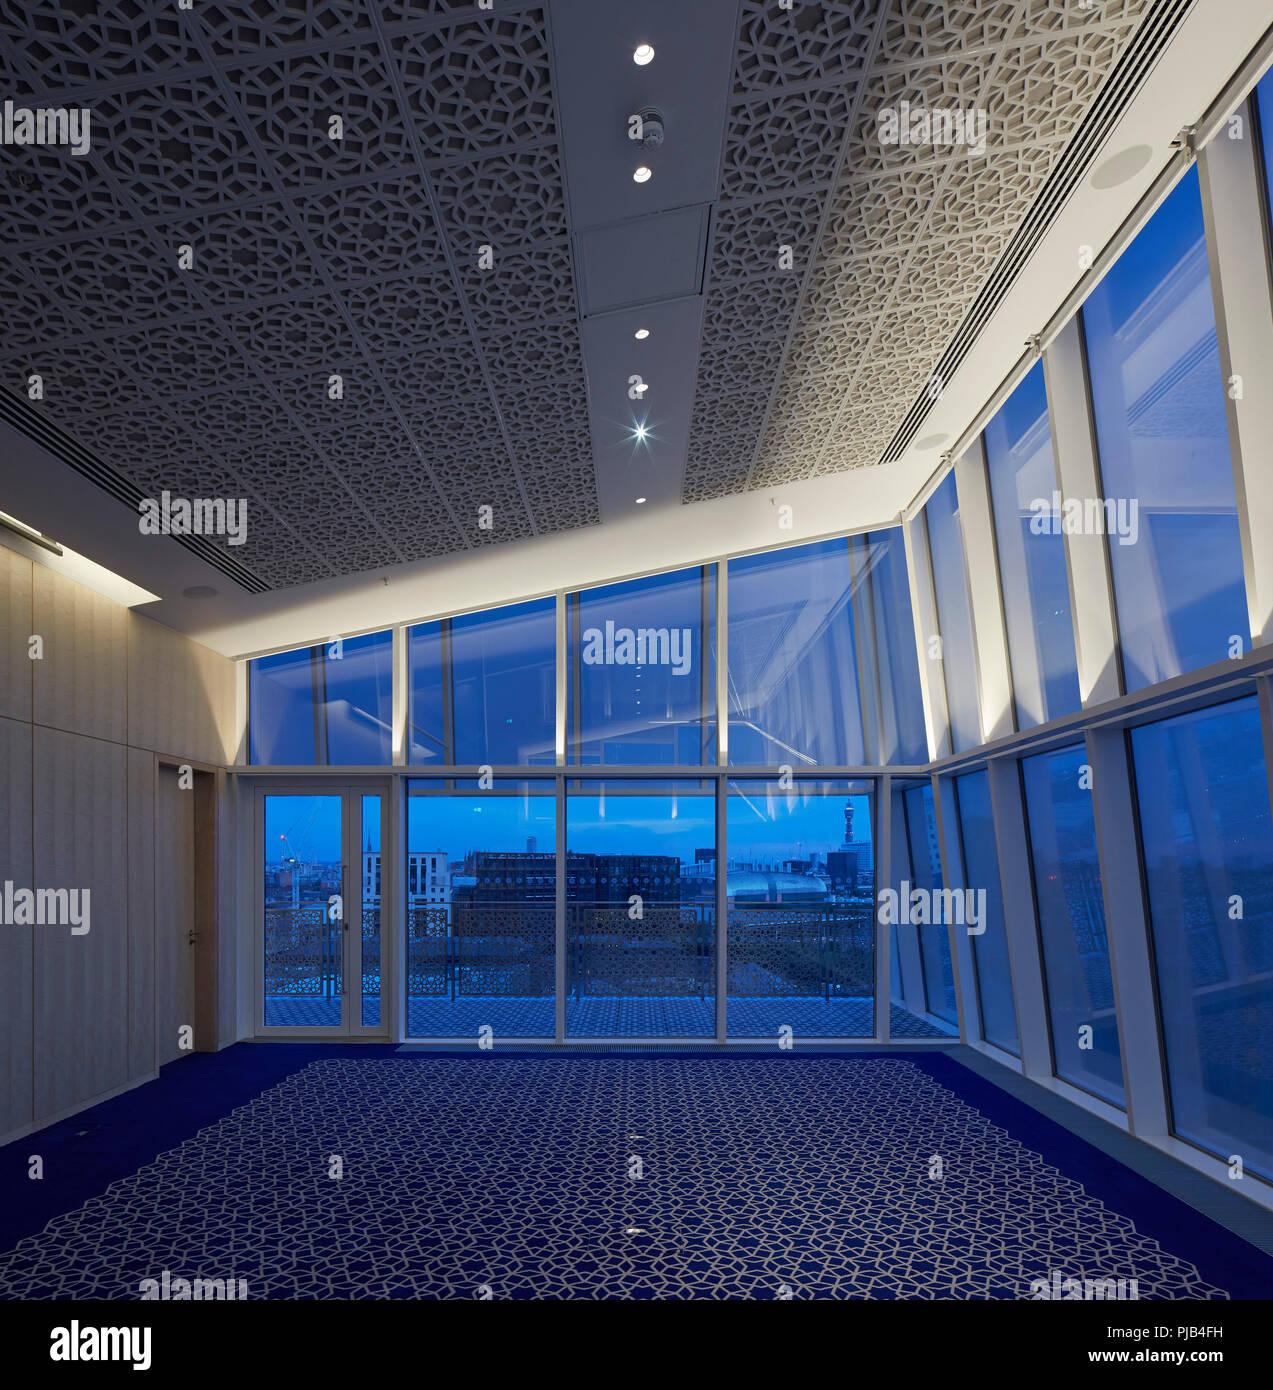 Upper level office interior, viewed at dusk. Aga Khan Centre, London, United Kingdom. Architect: Maki and Associates, 2018. Stock Photo